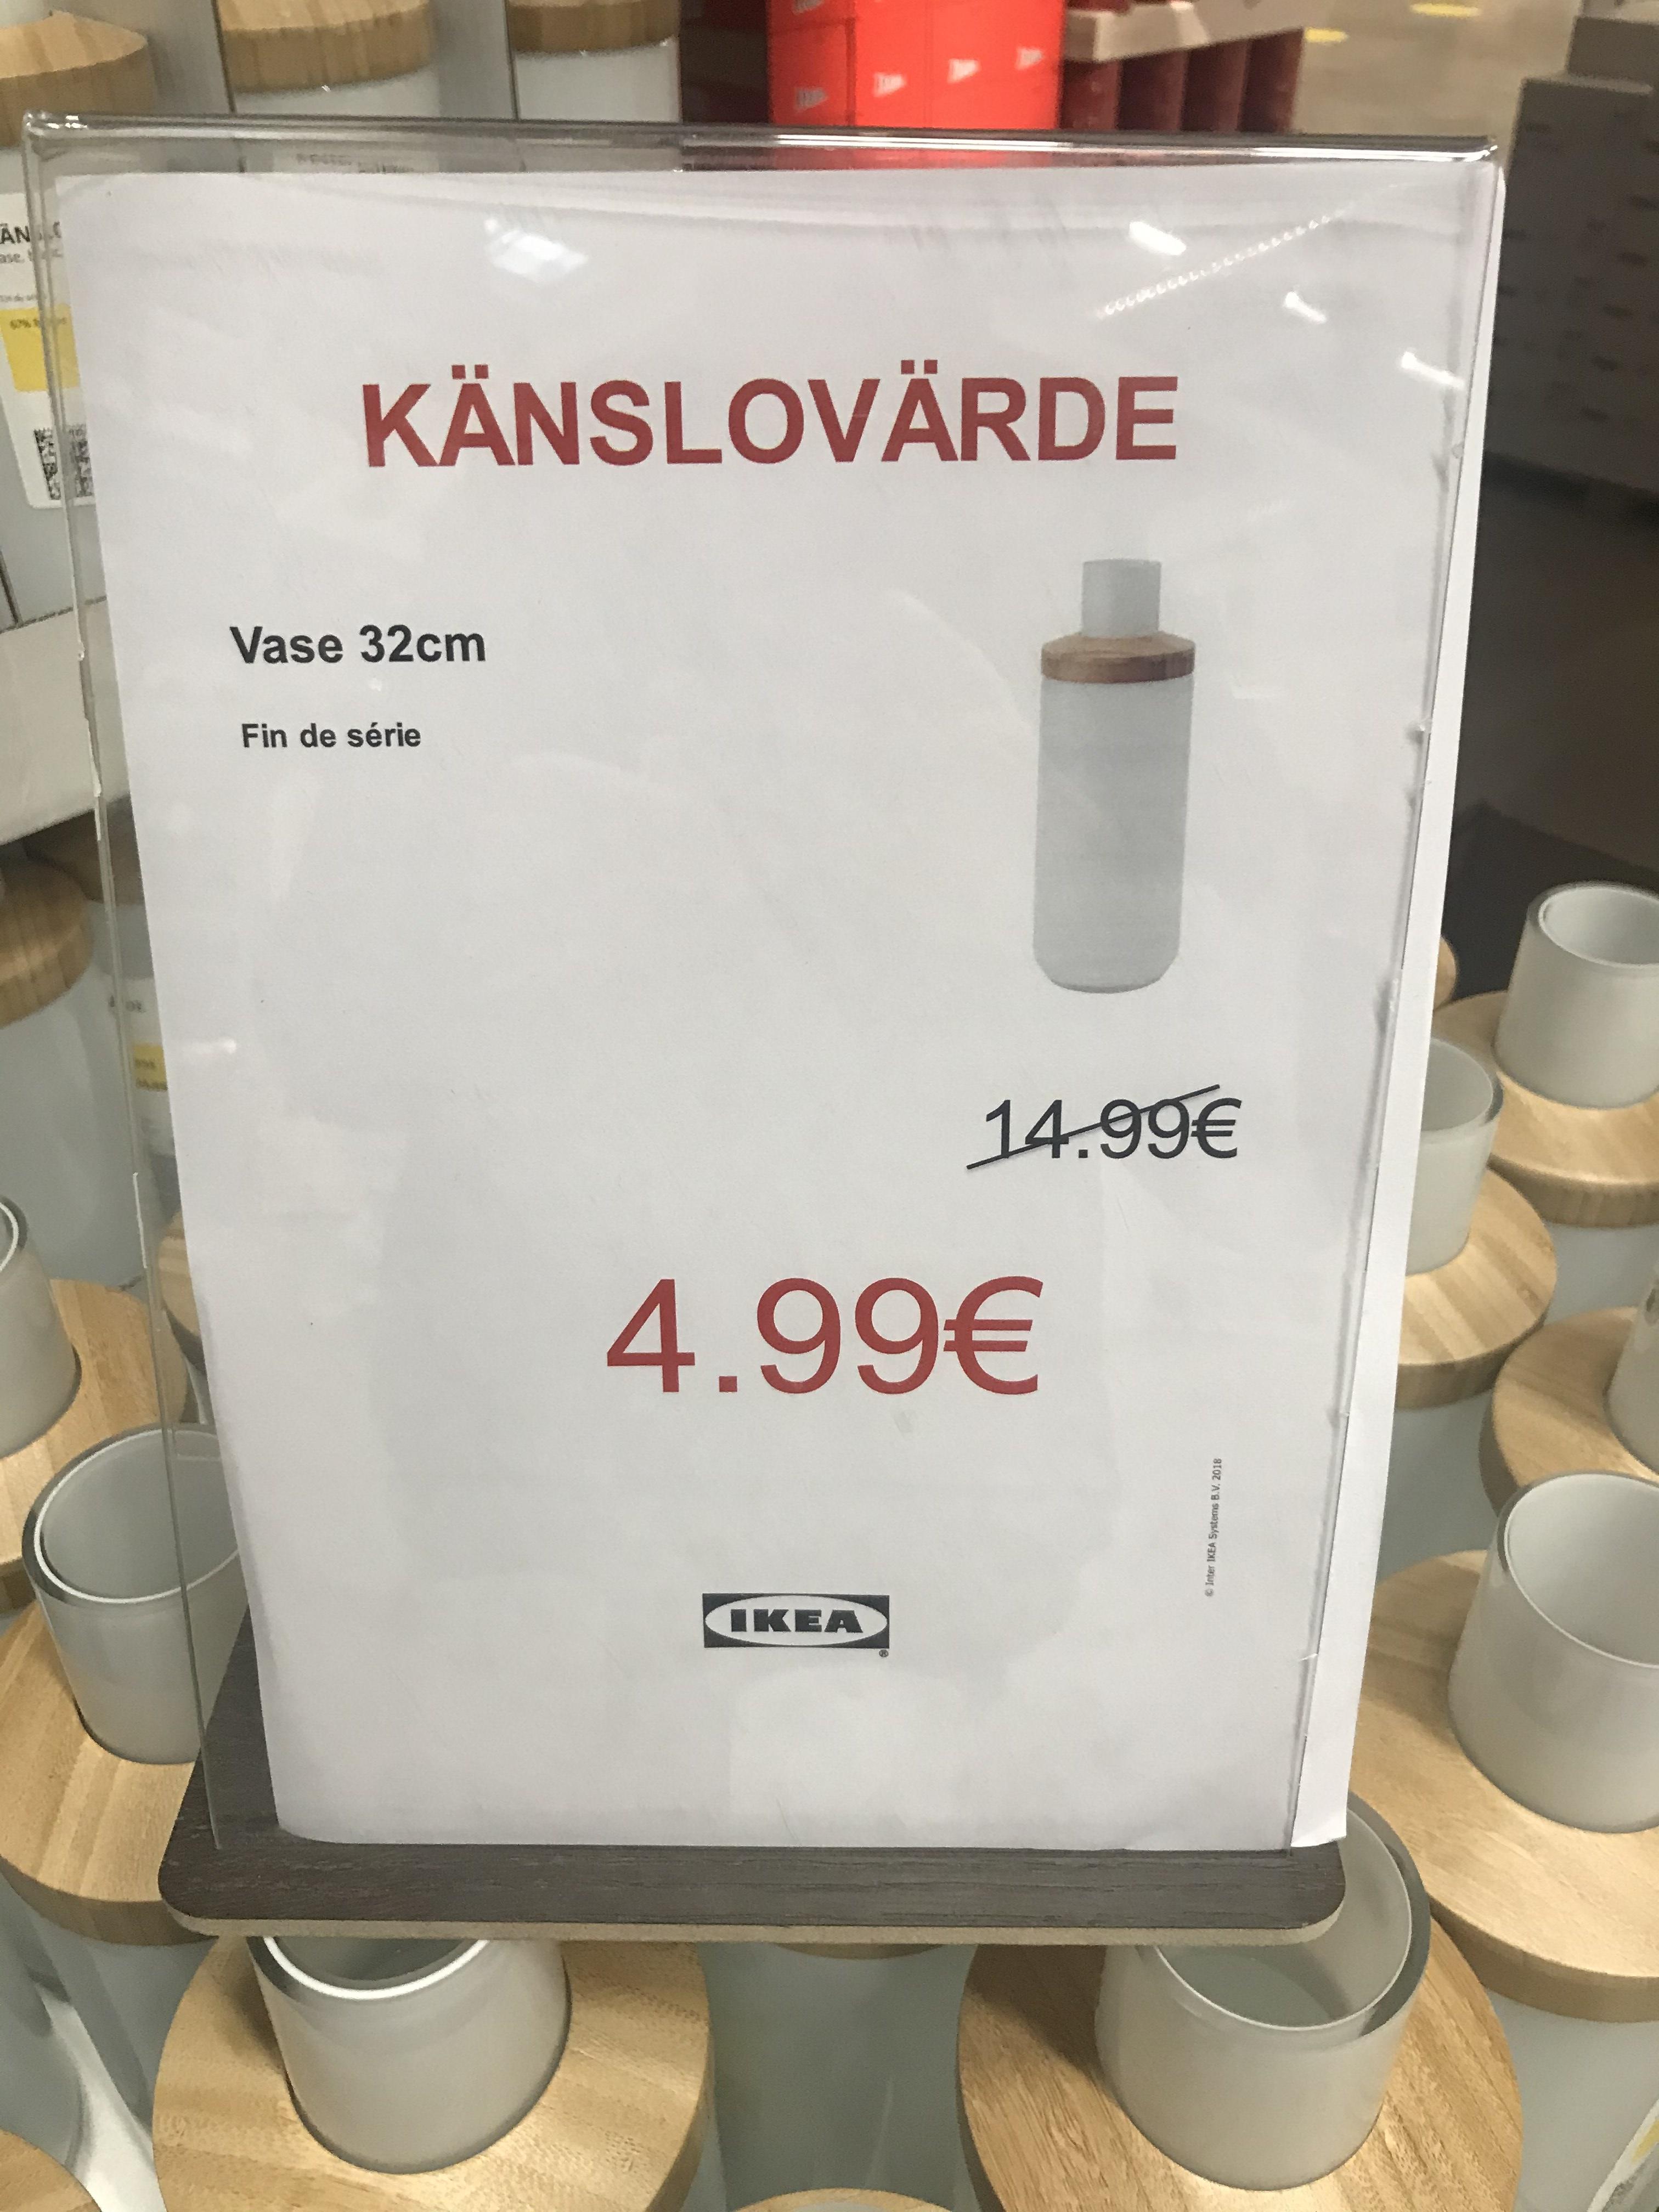 Vase Känslovärde - Ikea Tourville la rivière (76)